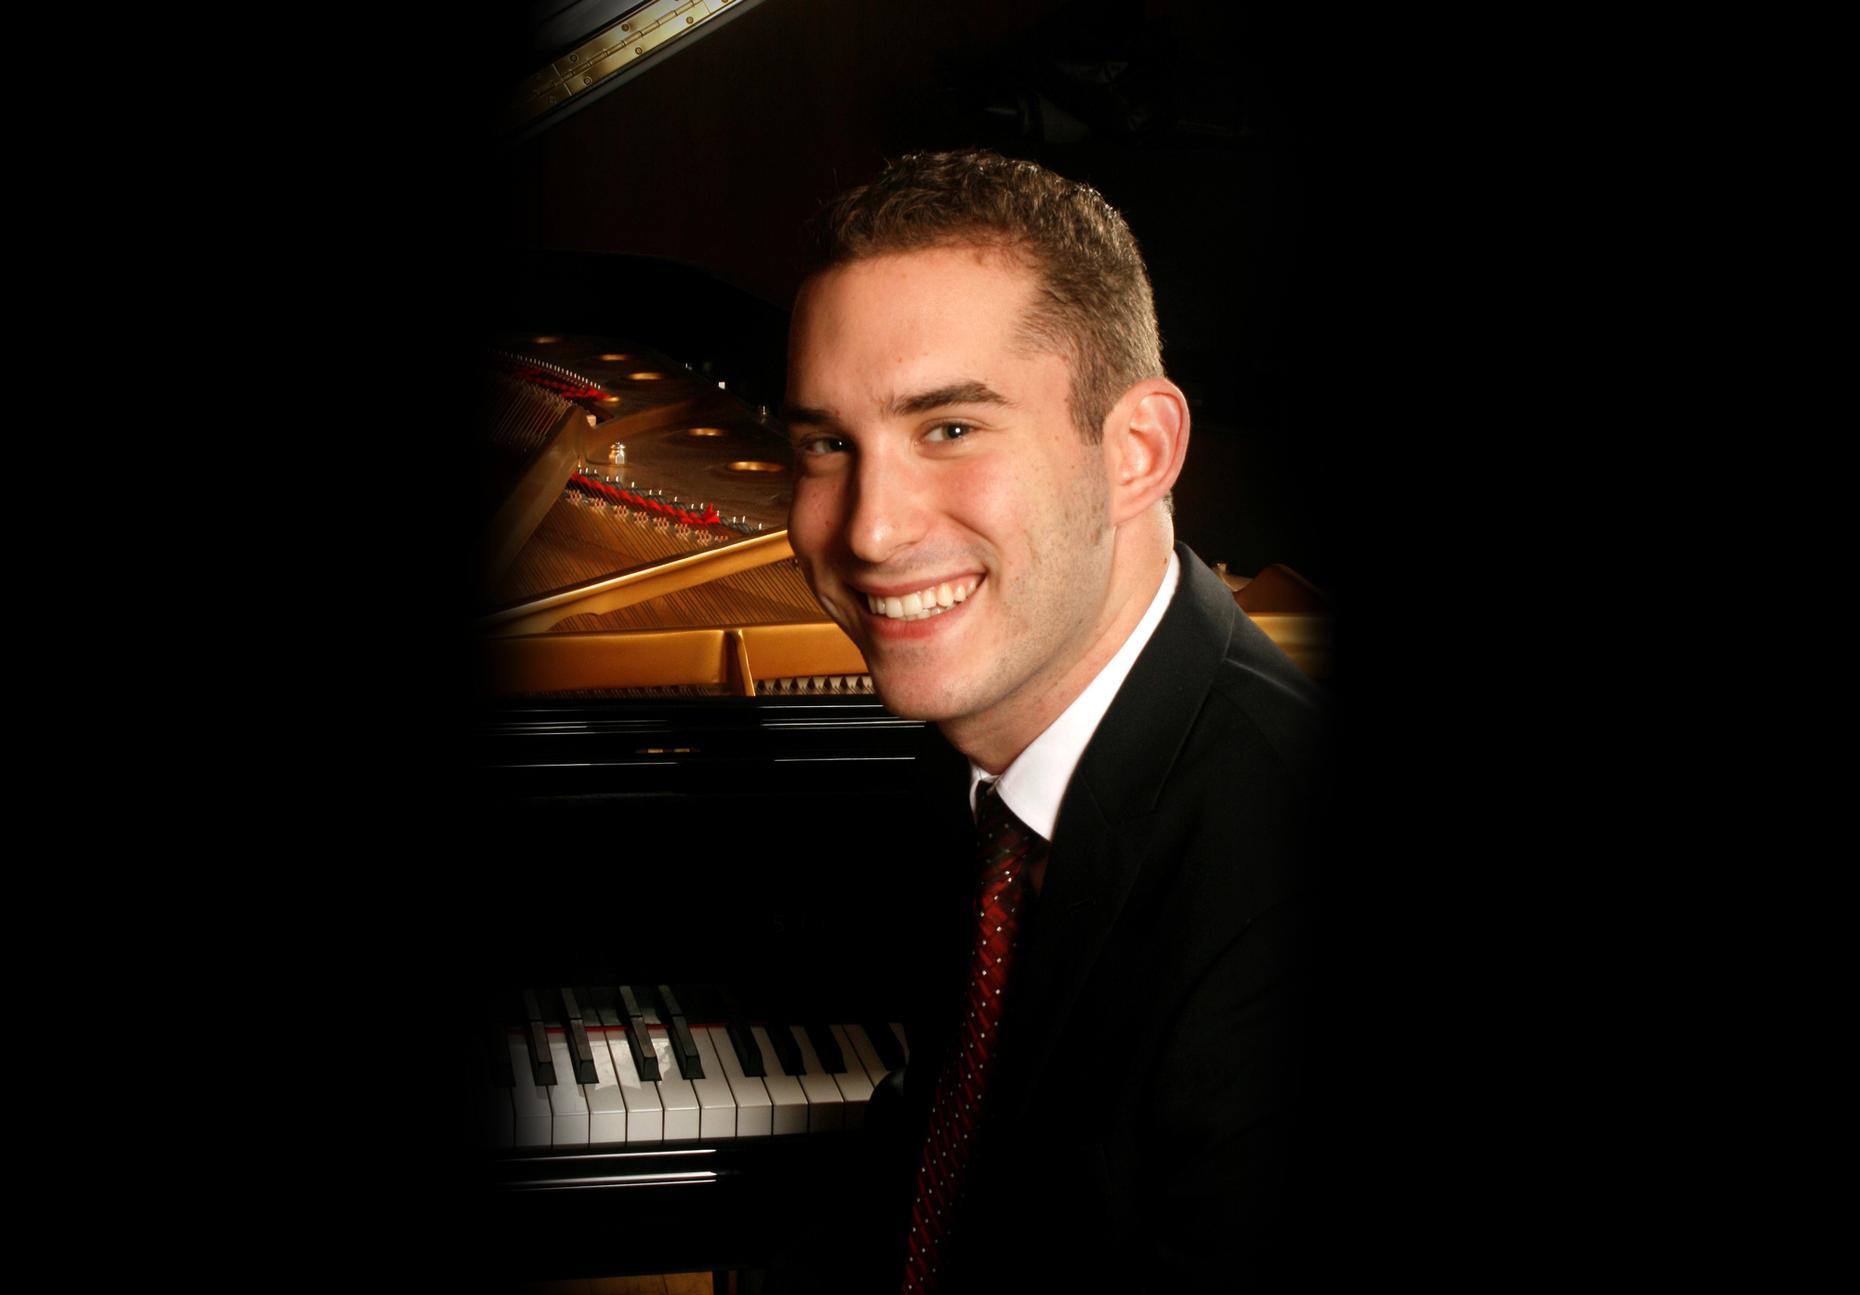 WQXR Presents Midday Masterpieces: Pianist Mackenzie Melemed